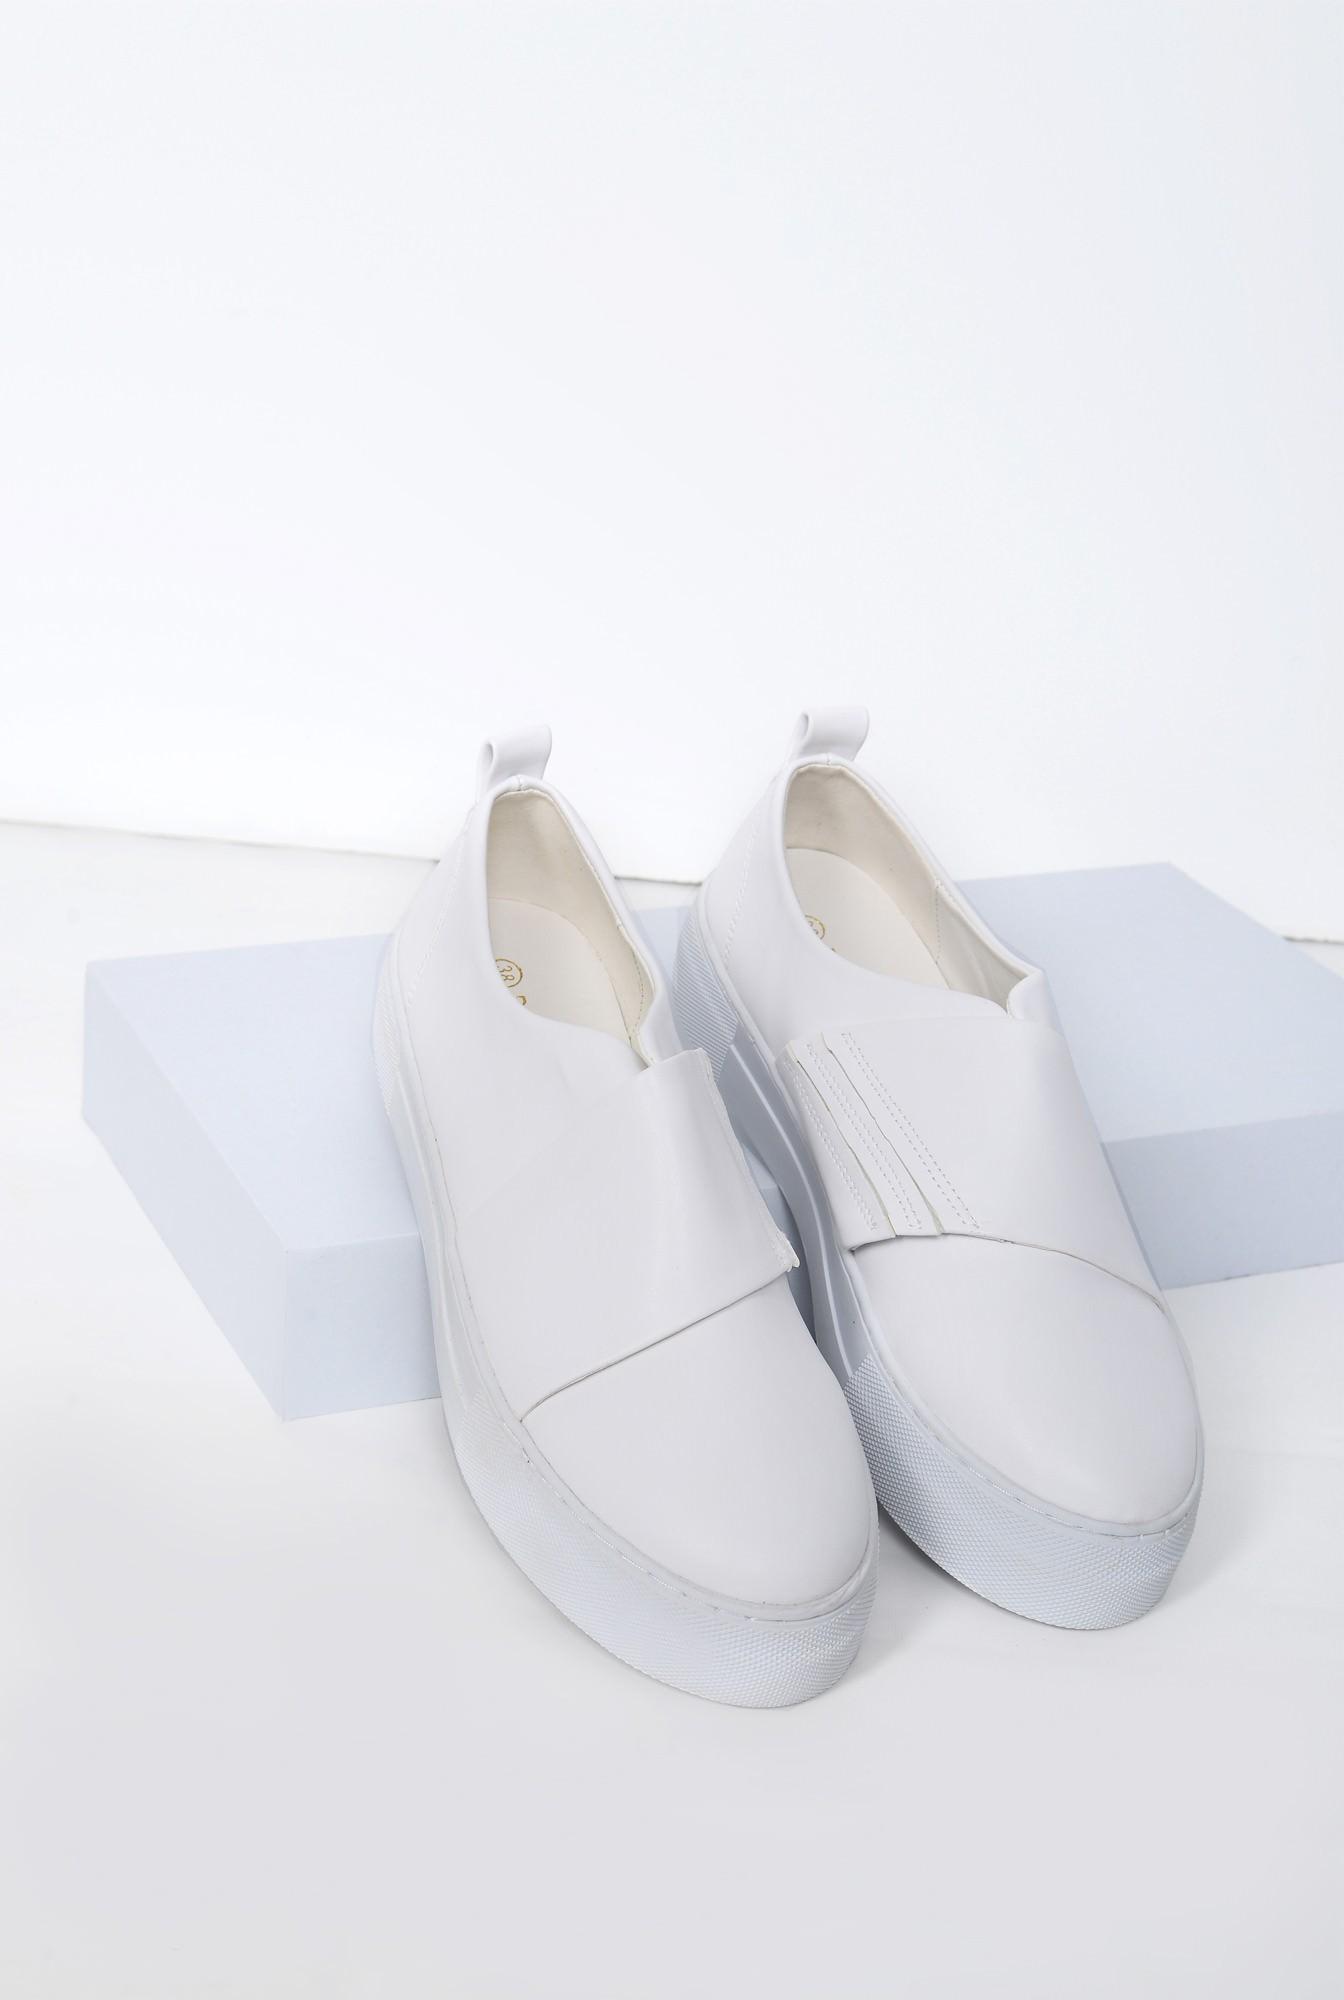 2 - Sneakers PO12091606-ALB